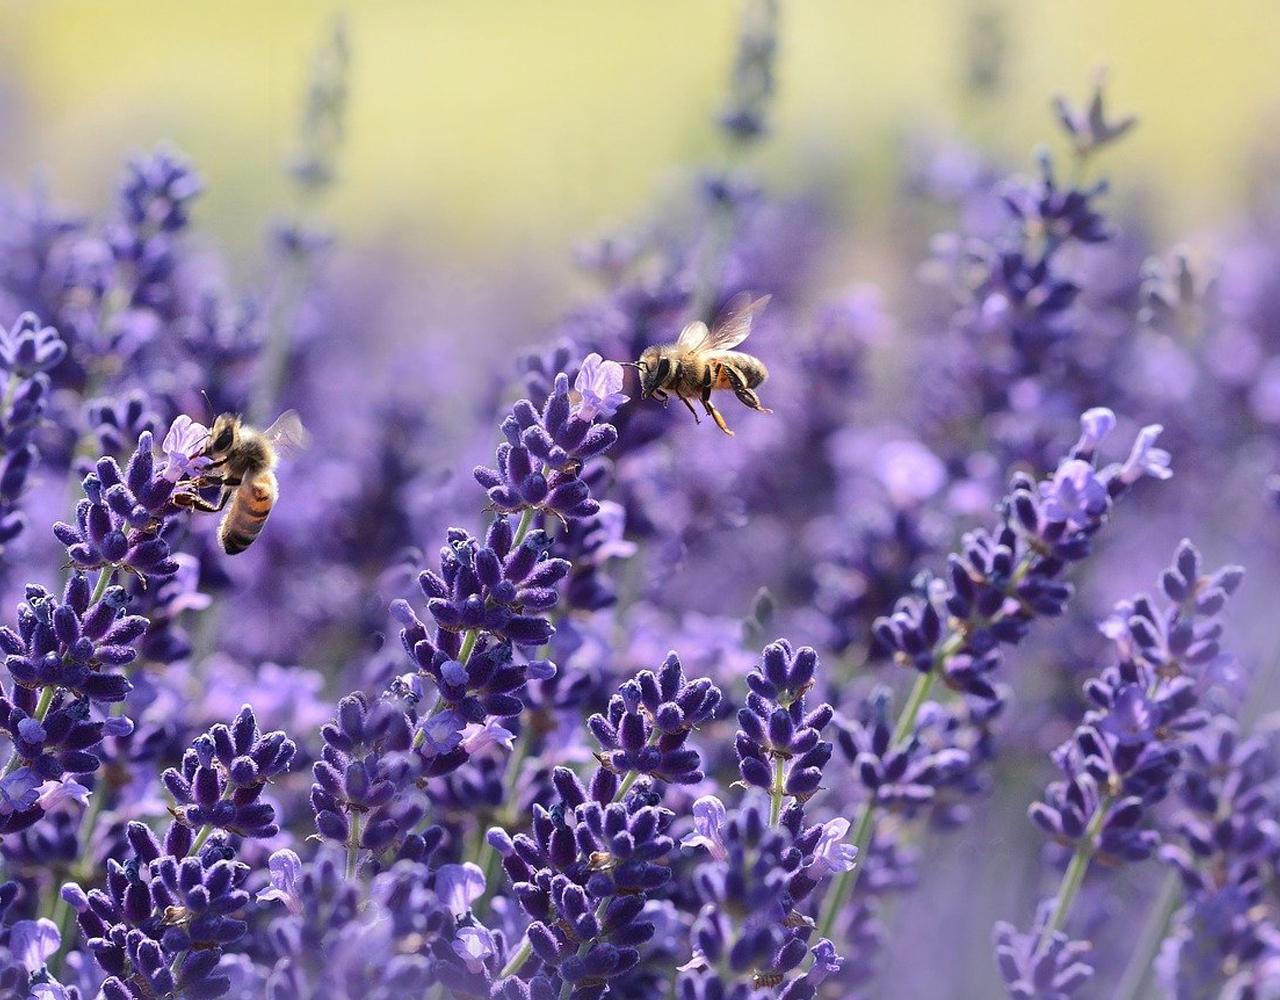 Lavender - Your garden in April